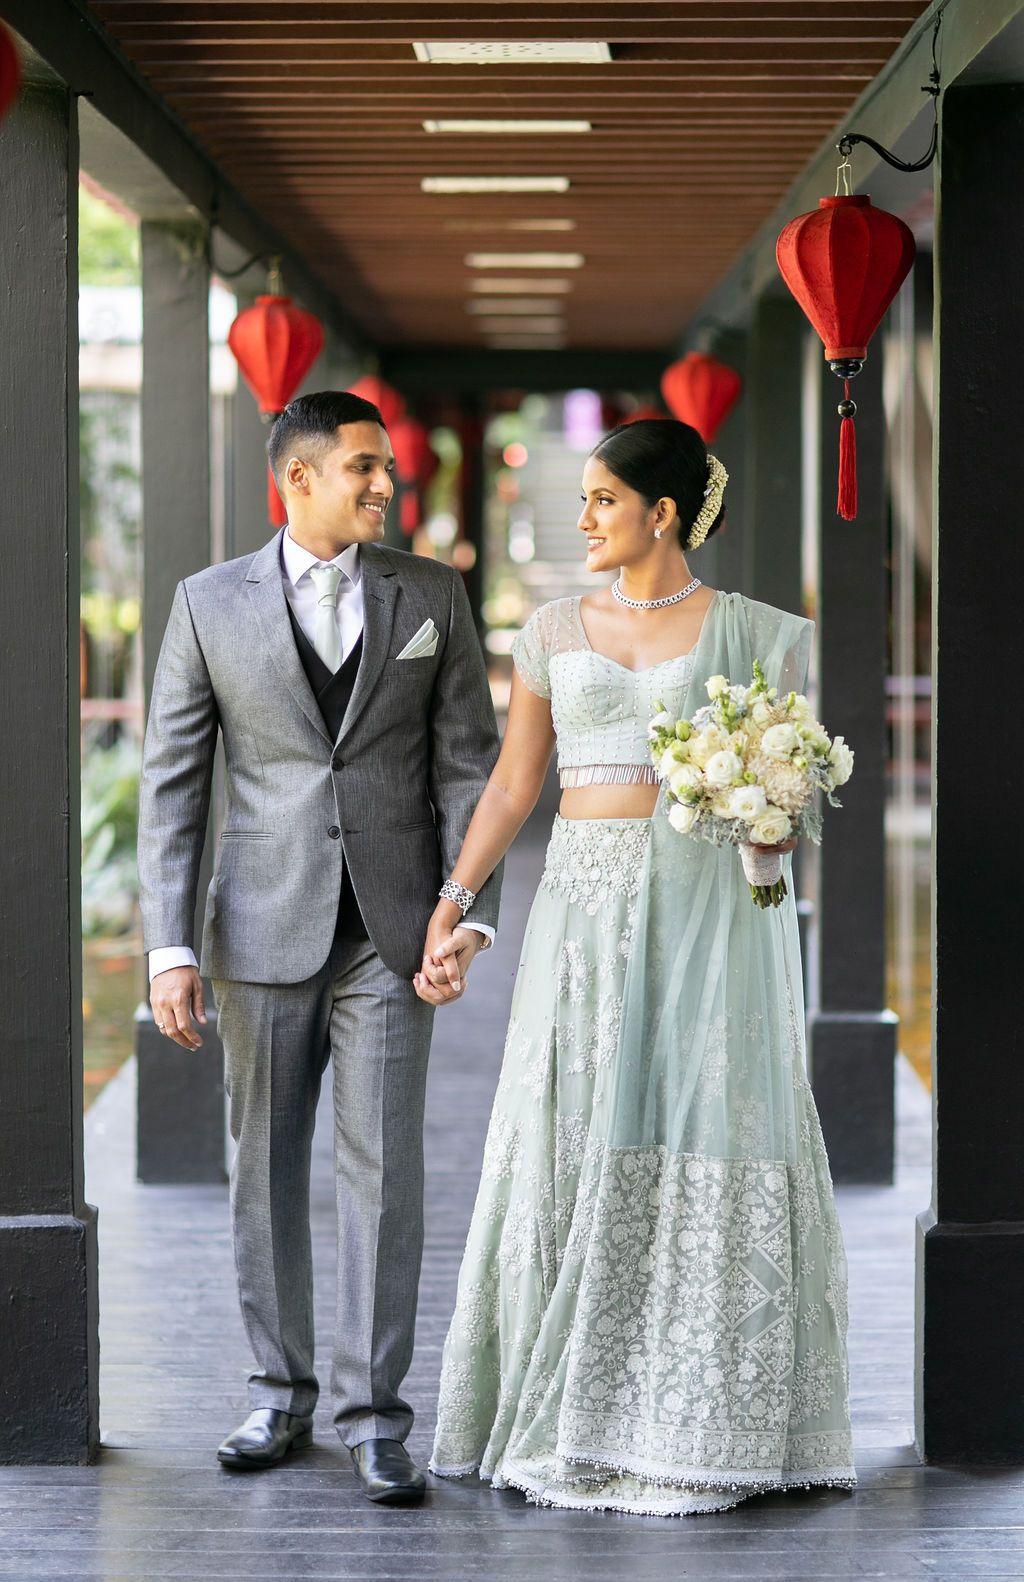 Lehenga Sri Lanka Bridal Bride Saree Wedding Bridal Dresses Indian Sari Dress [ 1582 x 1024 Pixel ]